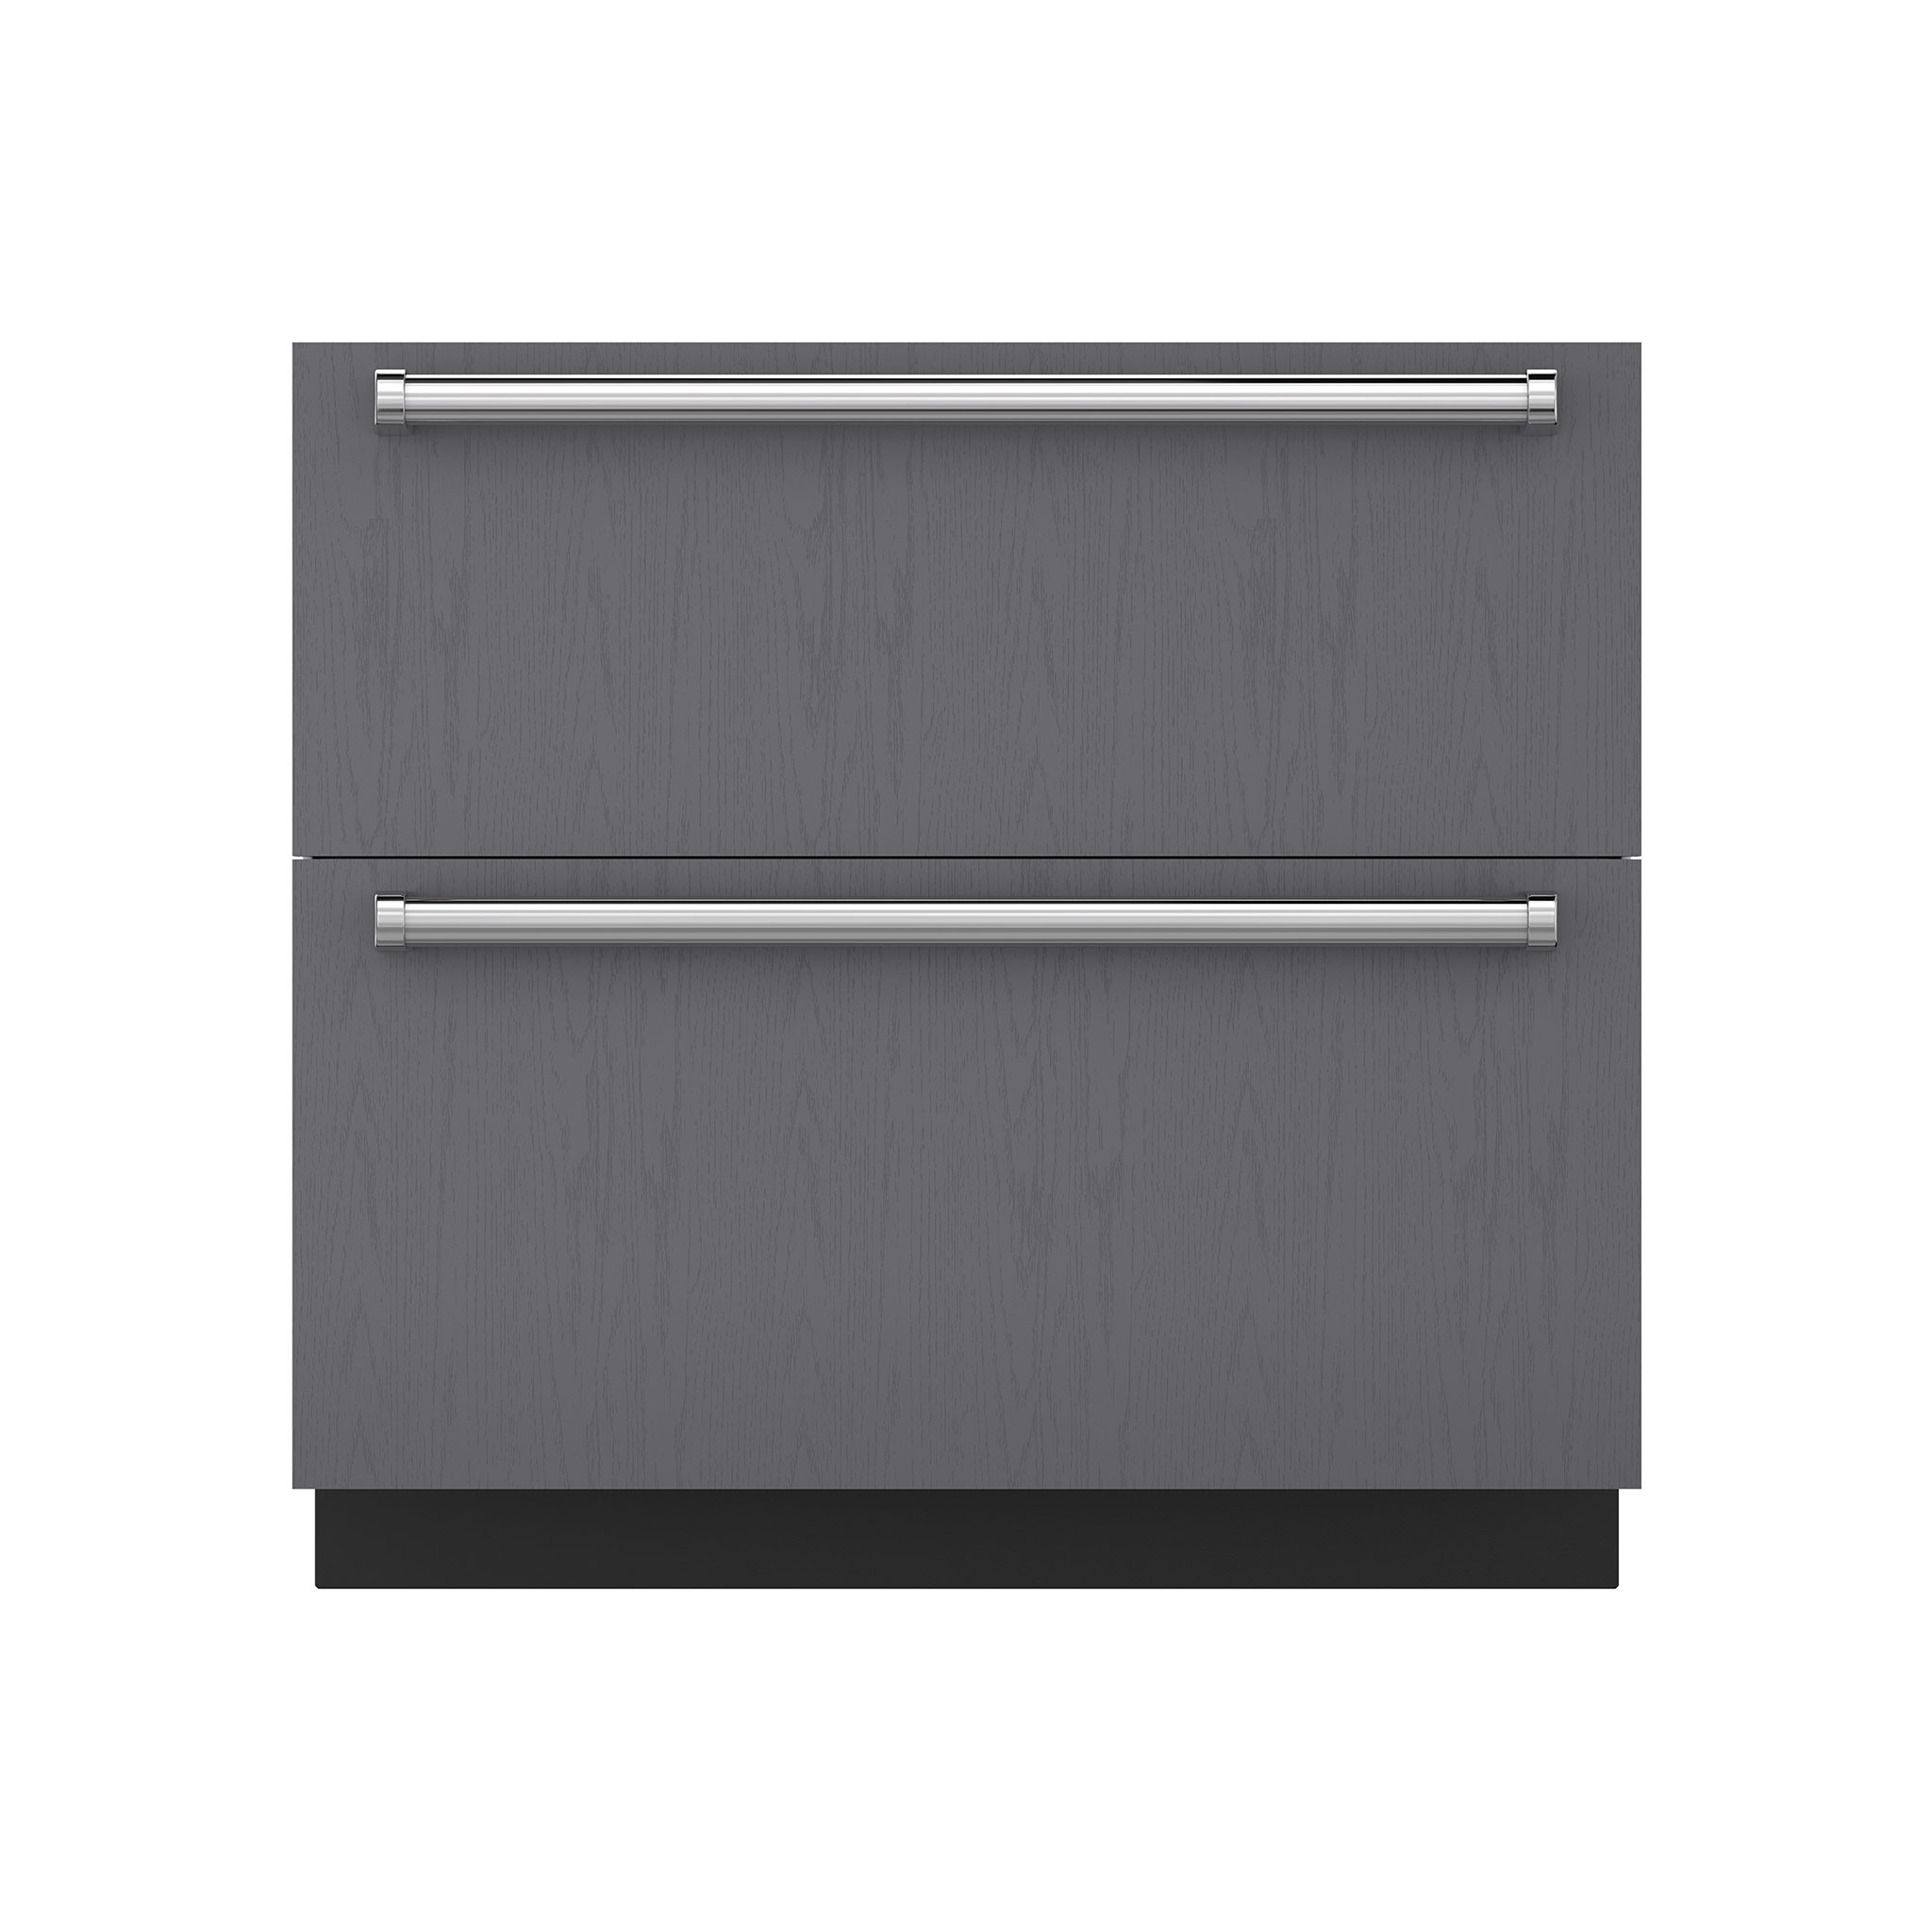 w door en drawer white polar nfl teka refrigerator by open line cold kitchen single